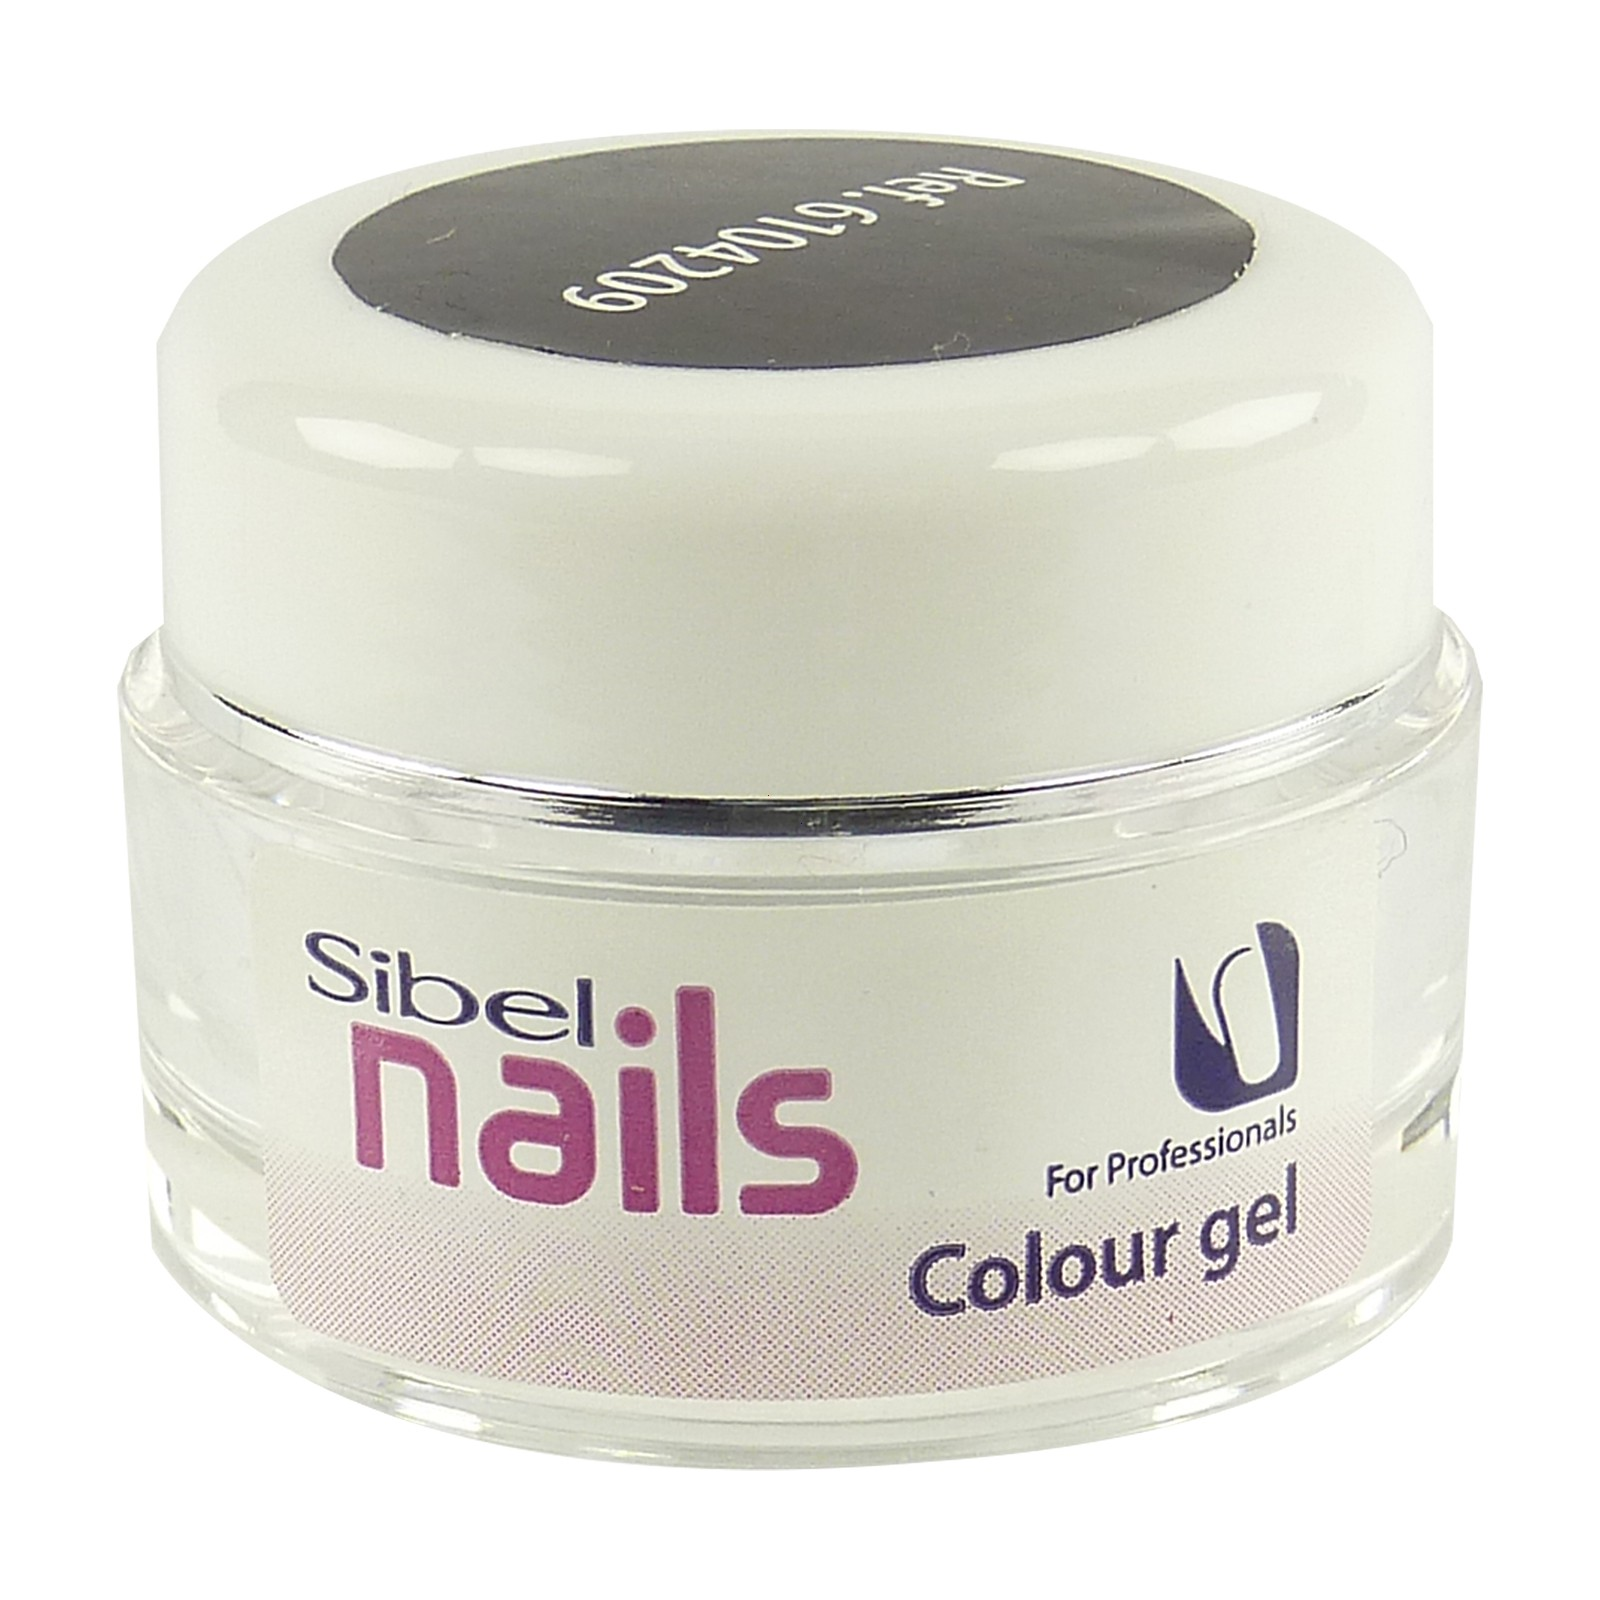 Sibel Nails Colour gel black Maniküre Nail Art Nagel Pflege Farbe schwarz 5ml